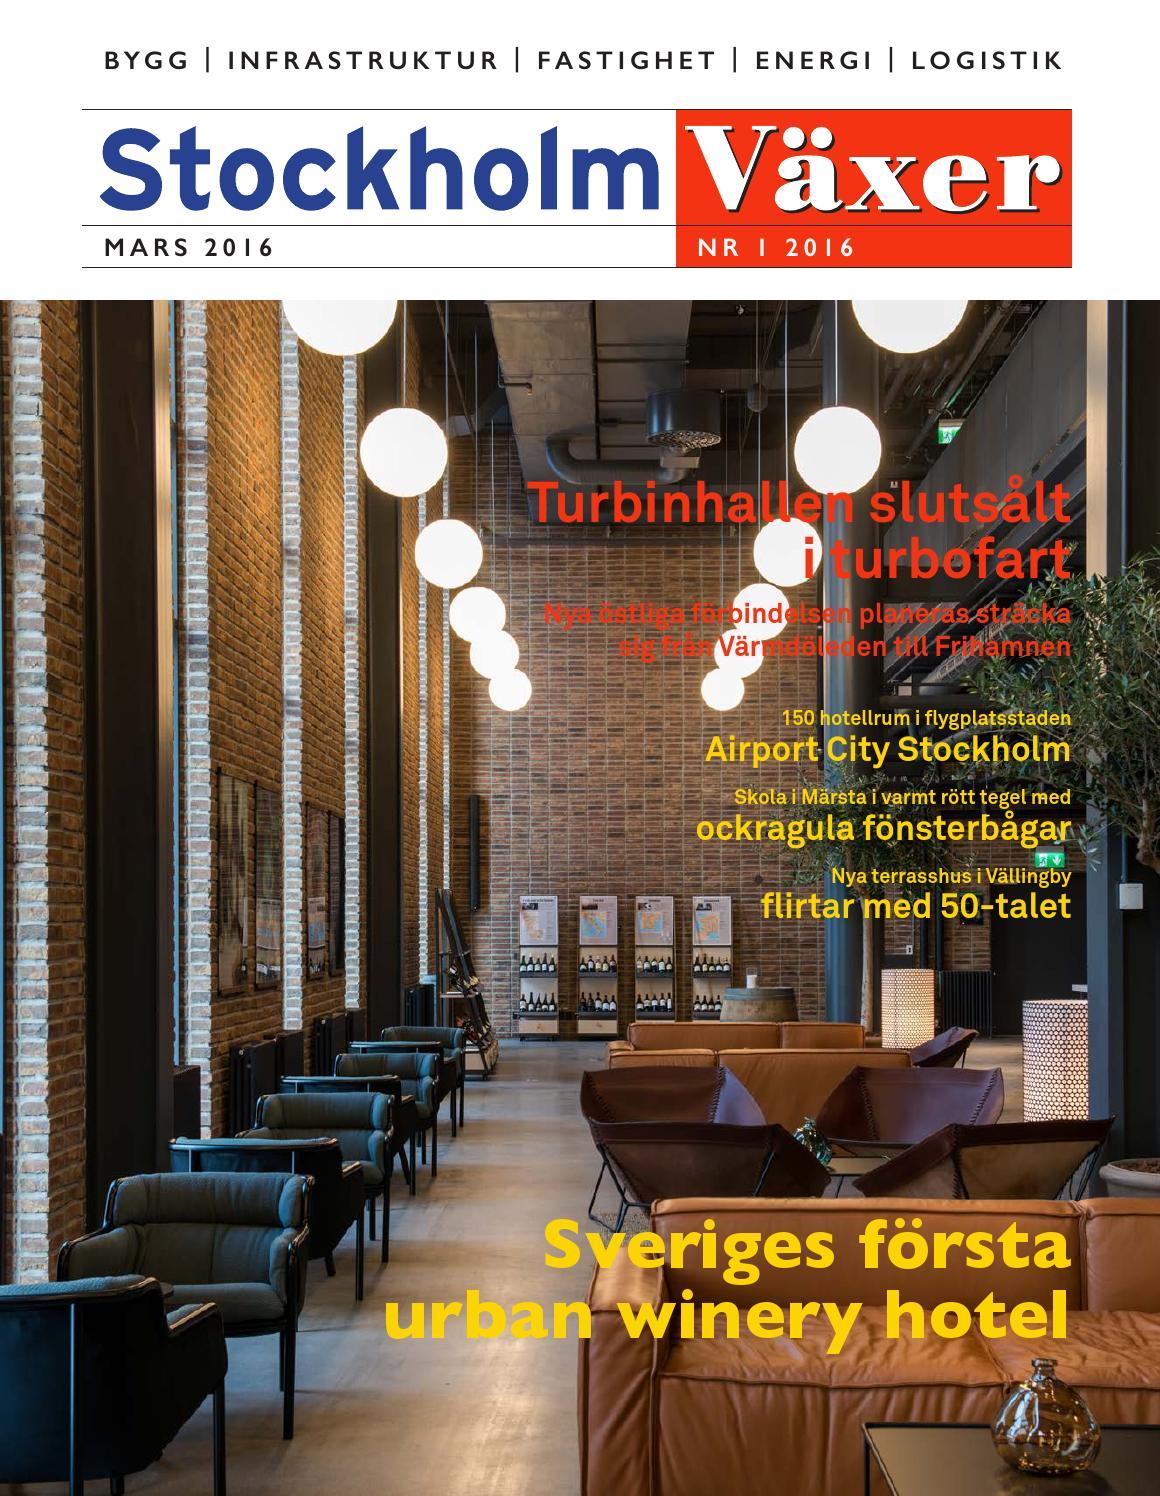 Stockholm växer 1 2016 by stordåhd kommunikation ab   issuu